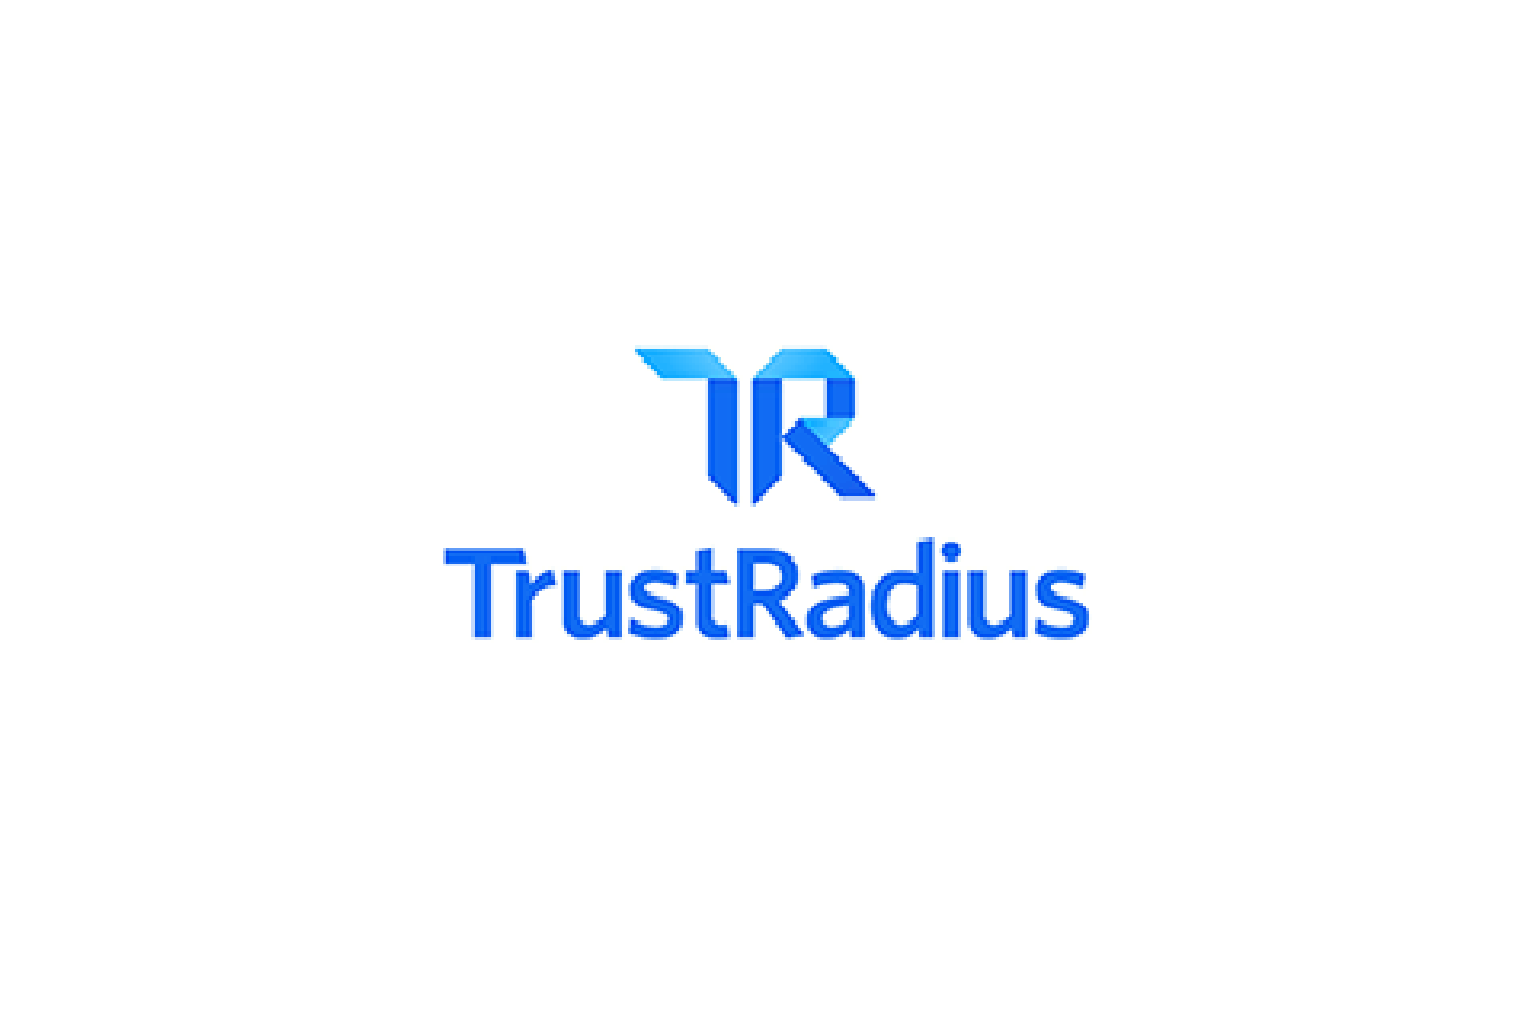 TrustRadius logo image